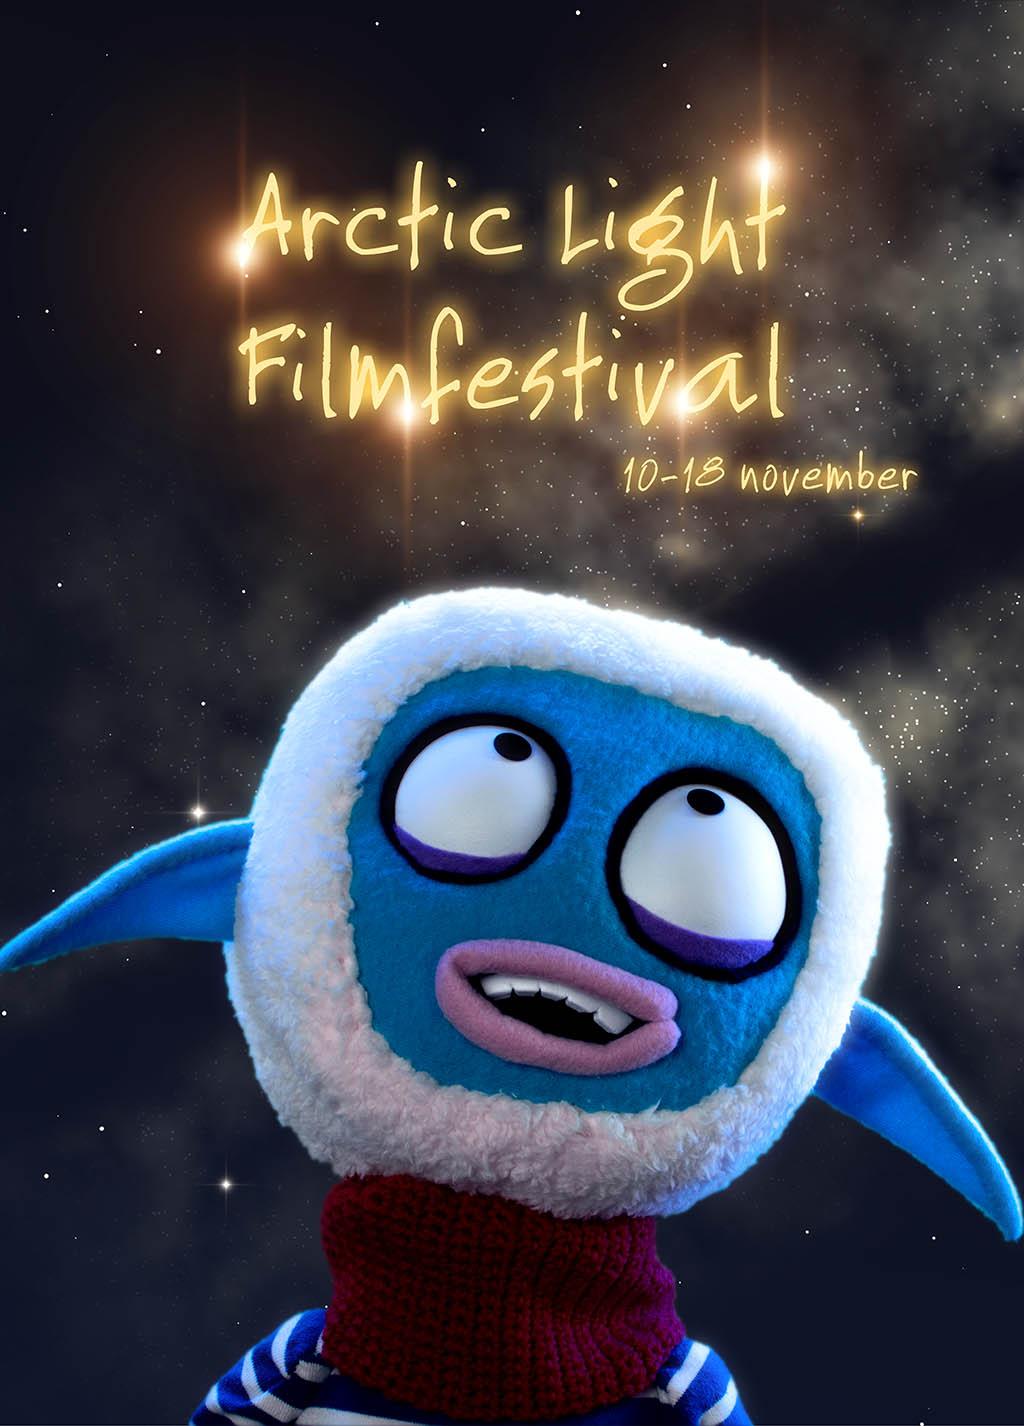 Arctic_light_filmfestival_2017_affisch